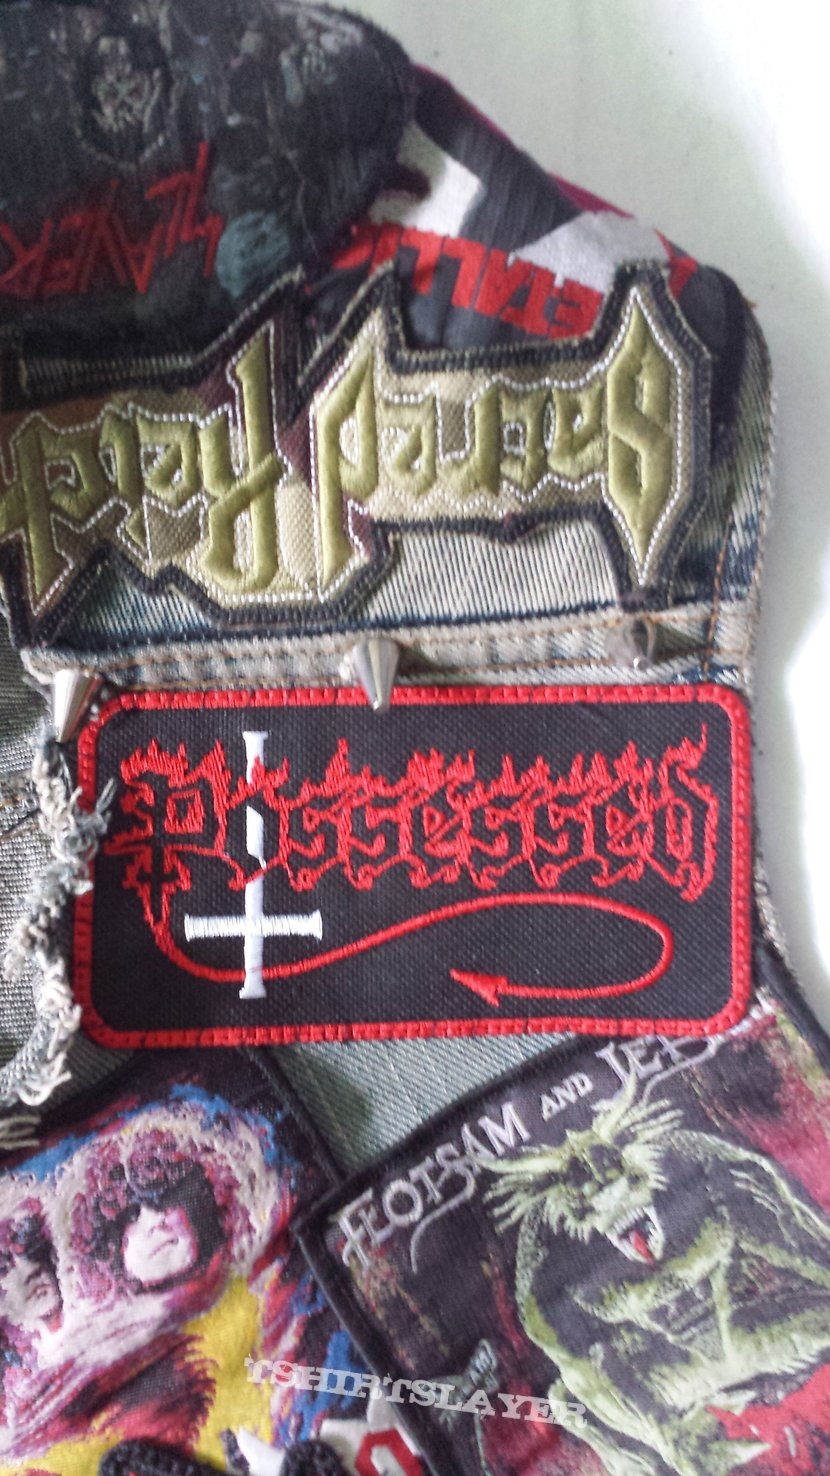 Kutte / Battle Jacket April 2015